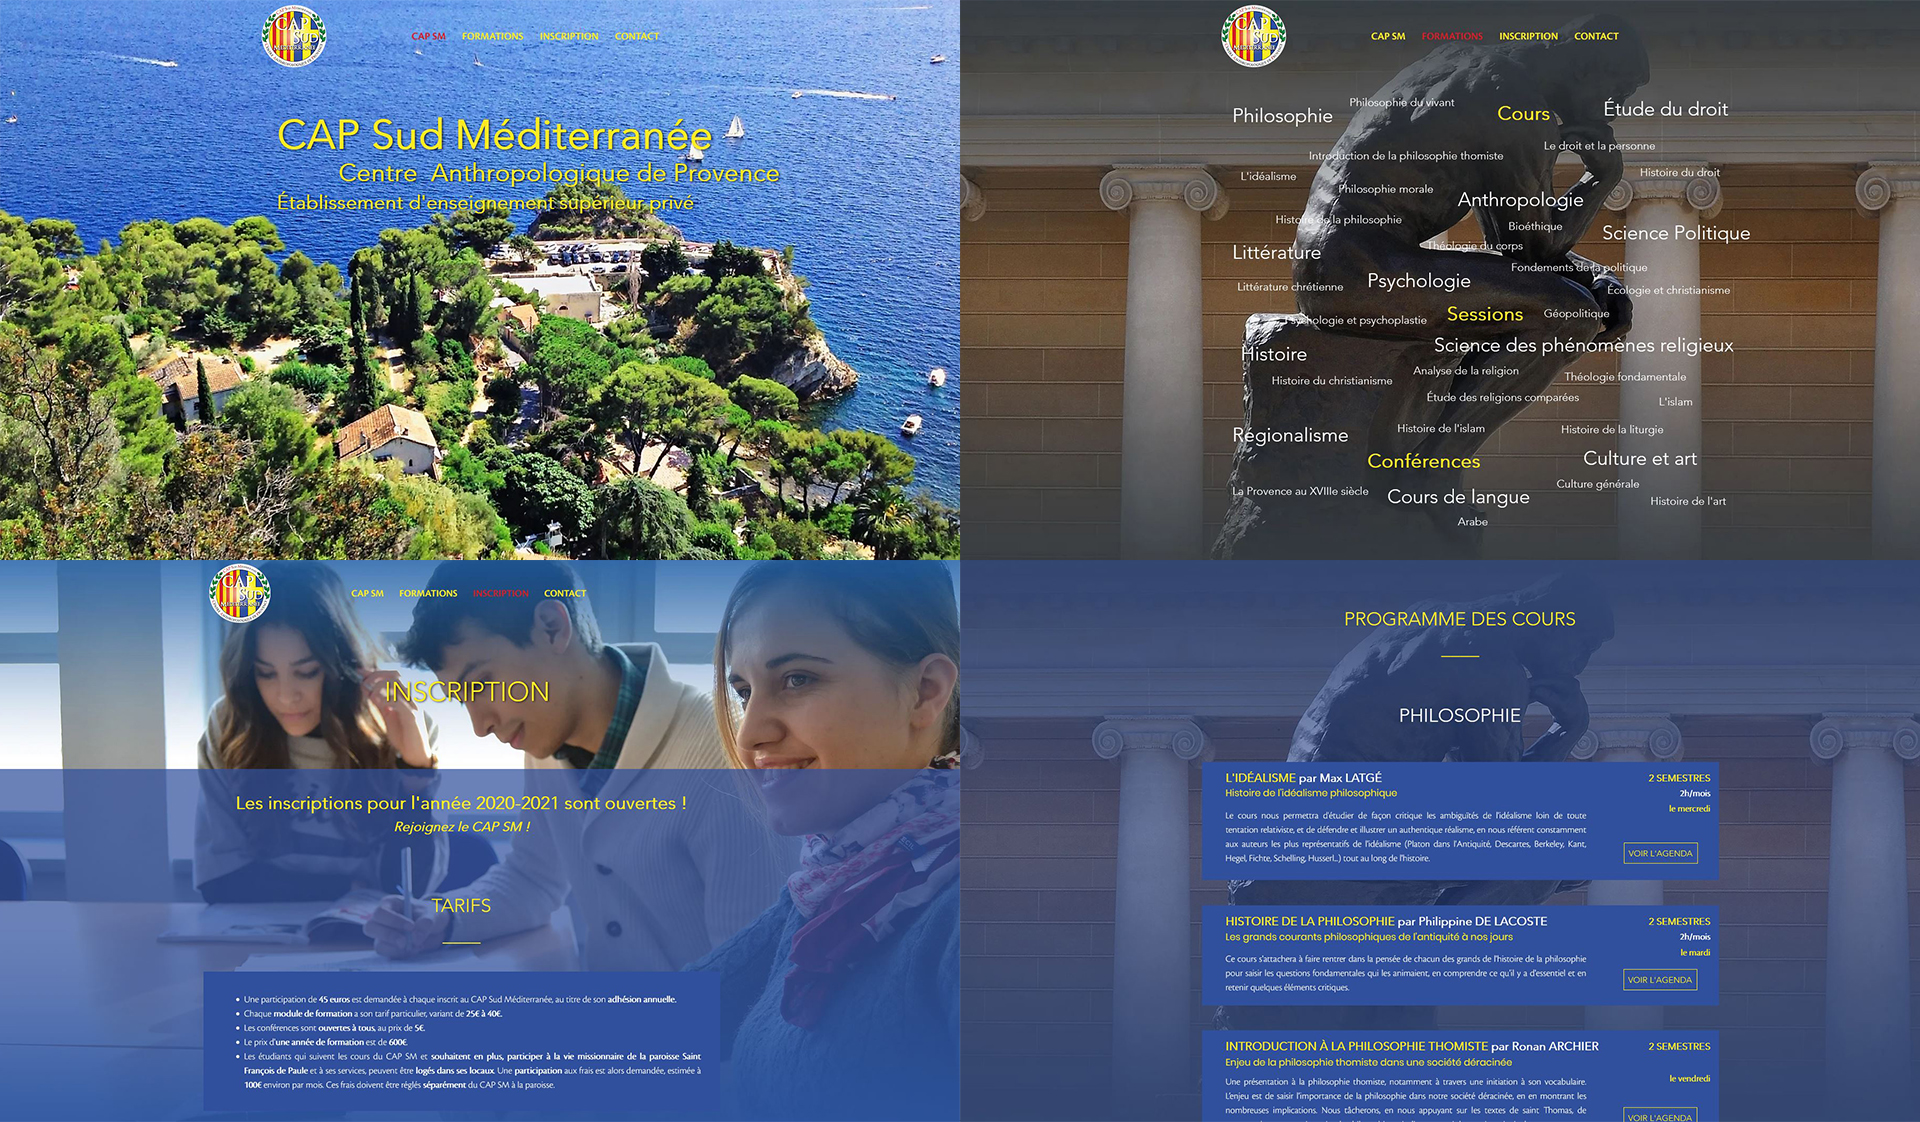 www.capsud-mediterranee.fr